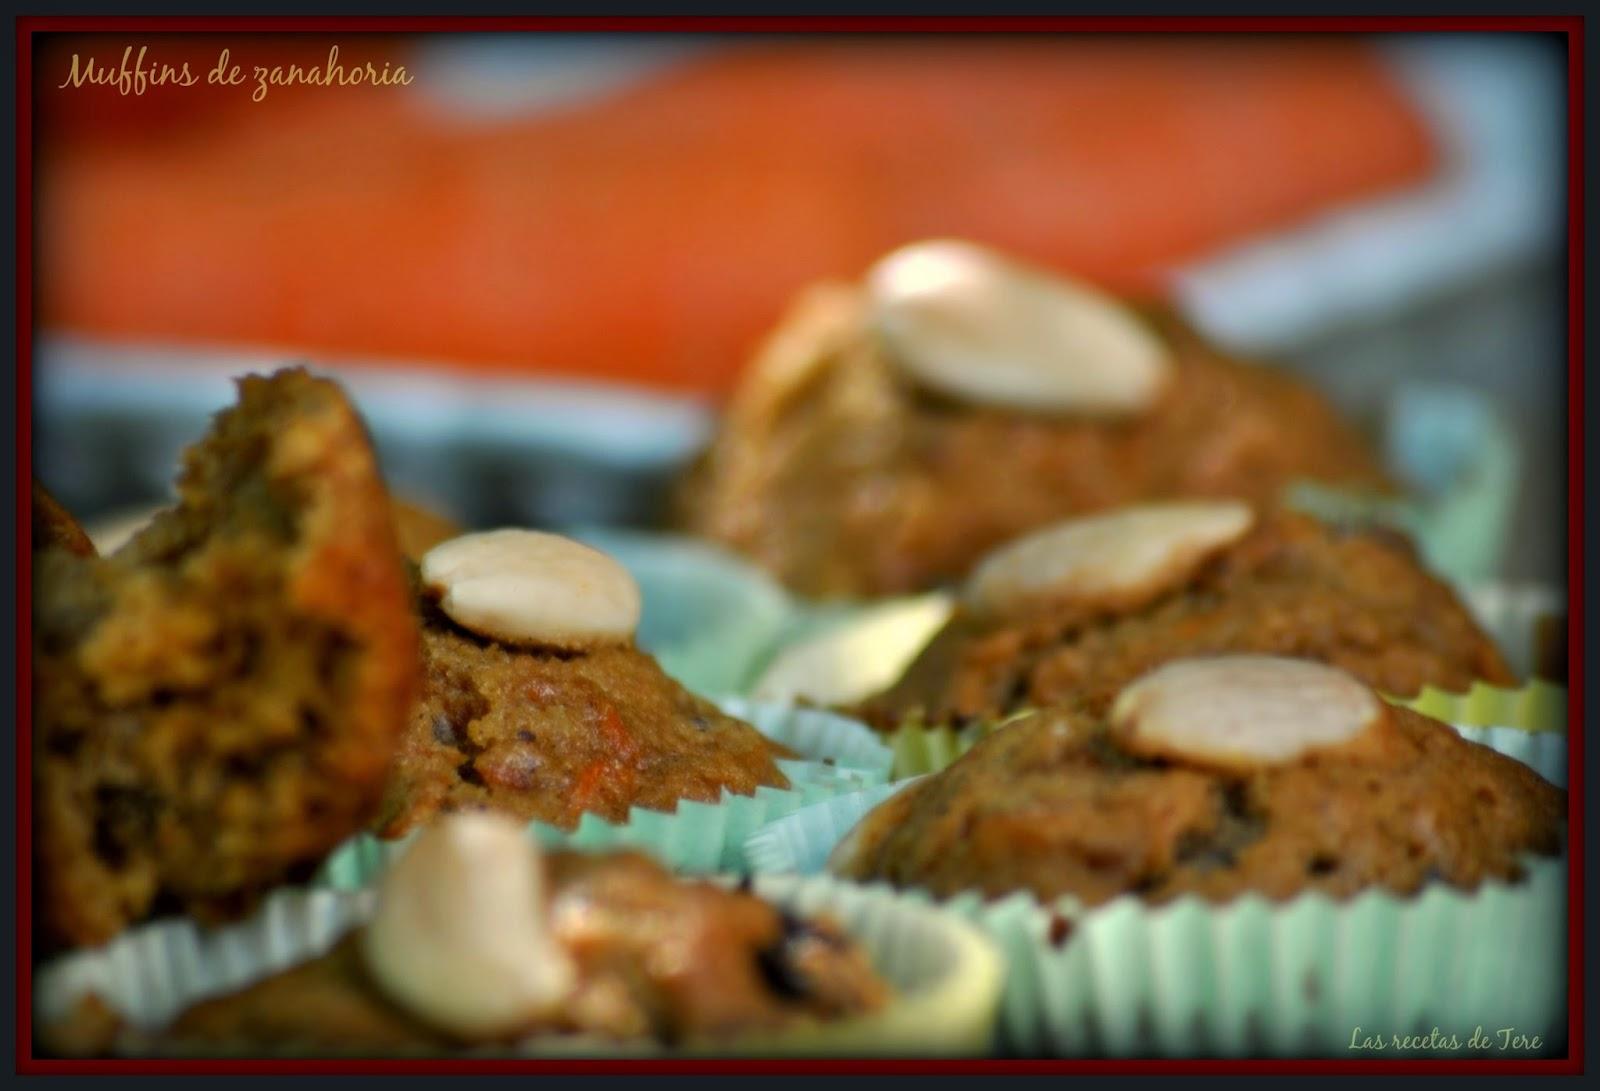 Muffins de zanahoria 01